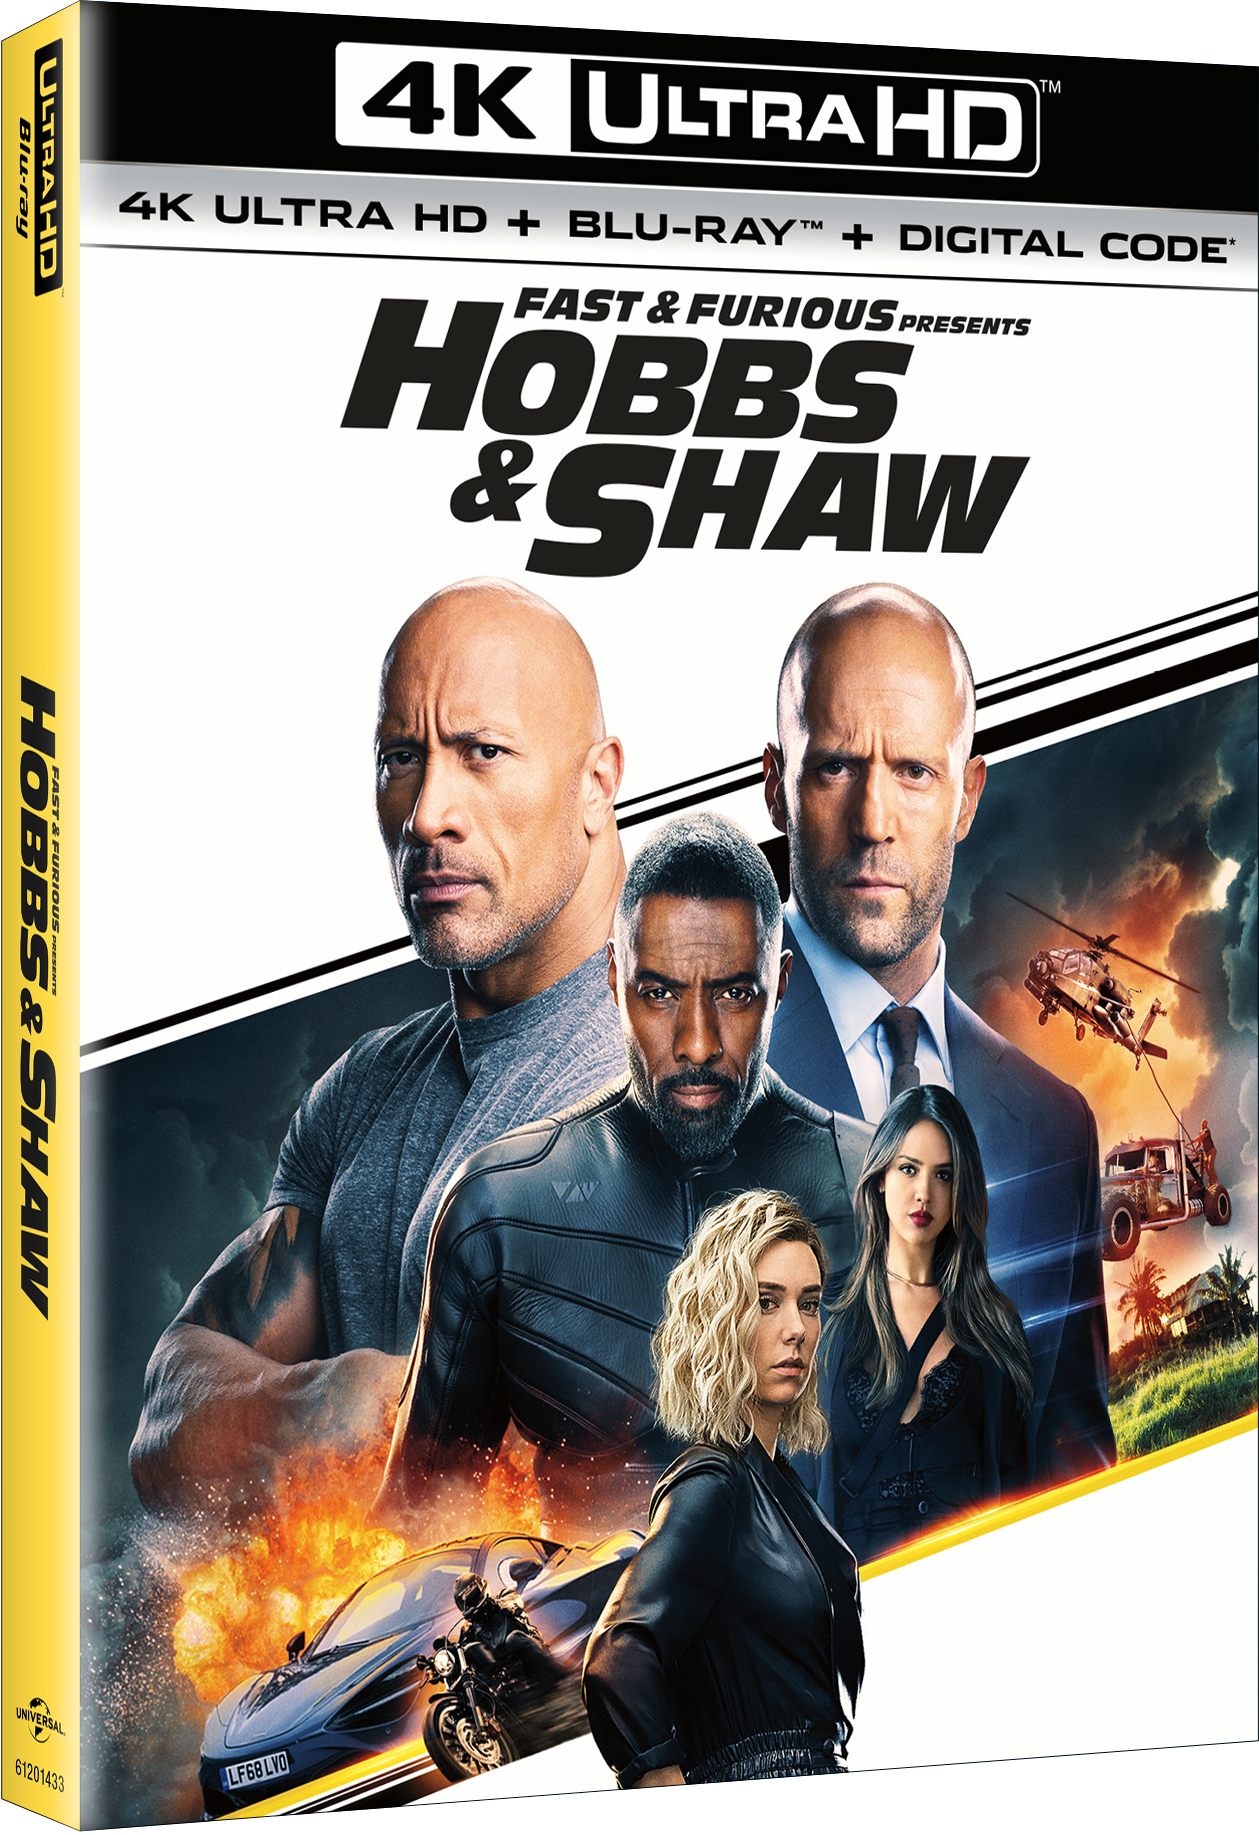 Buy Hobbs & Shaw on 4k Ultra-HD.